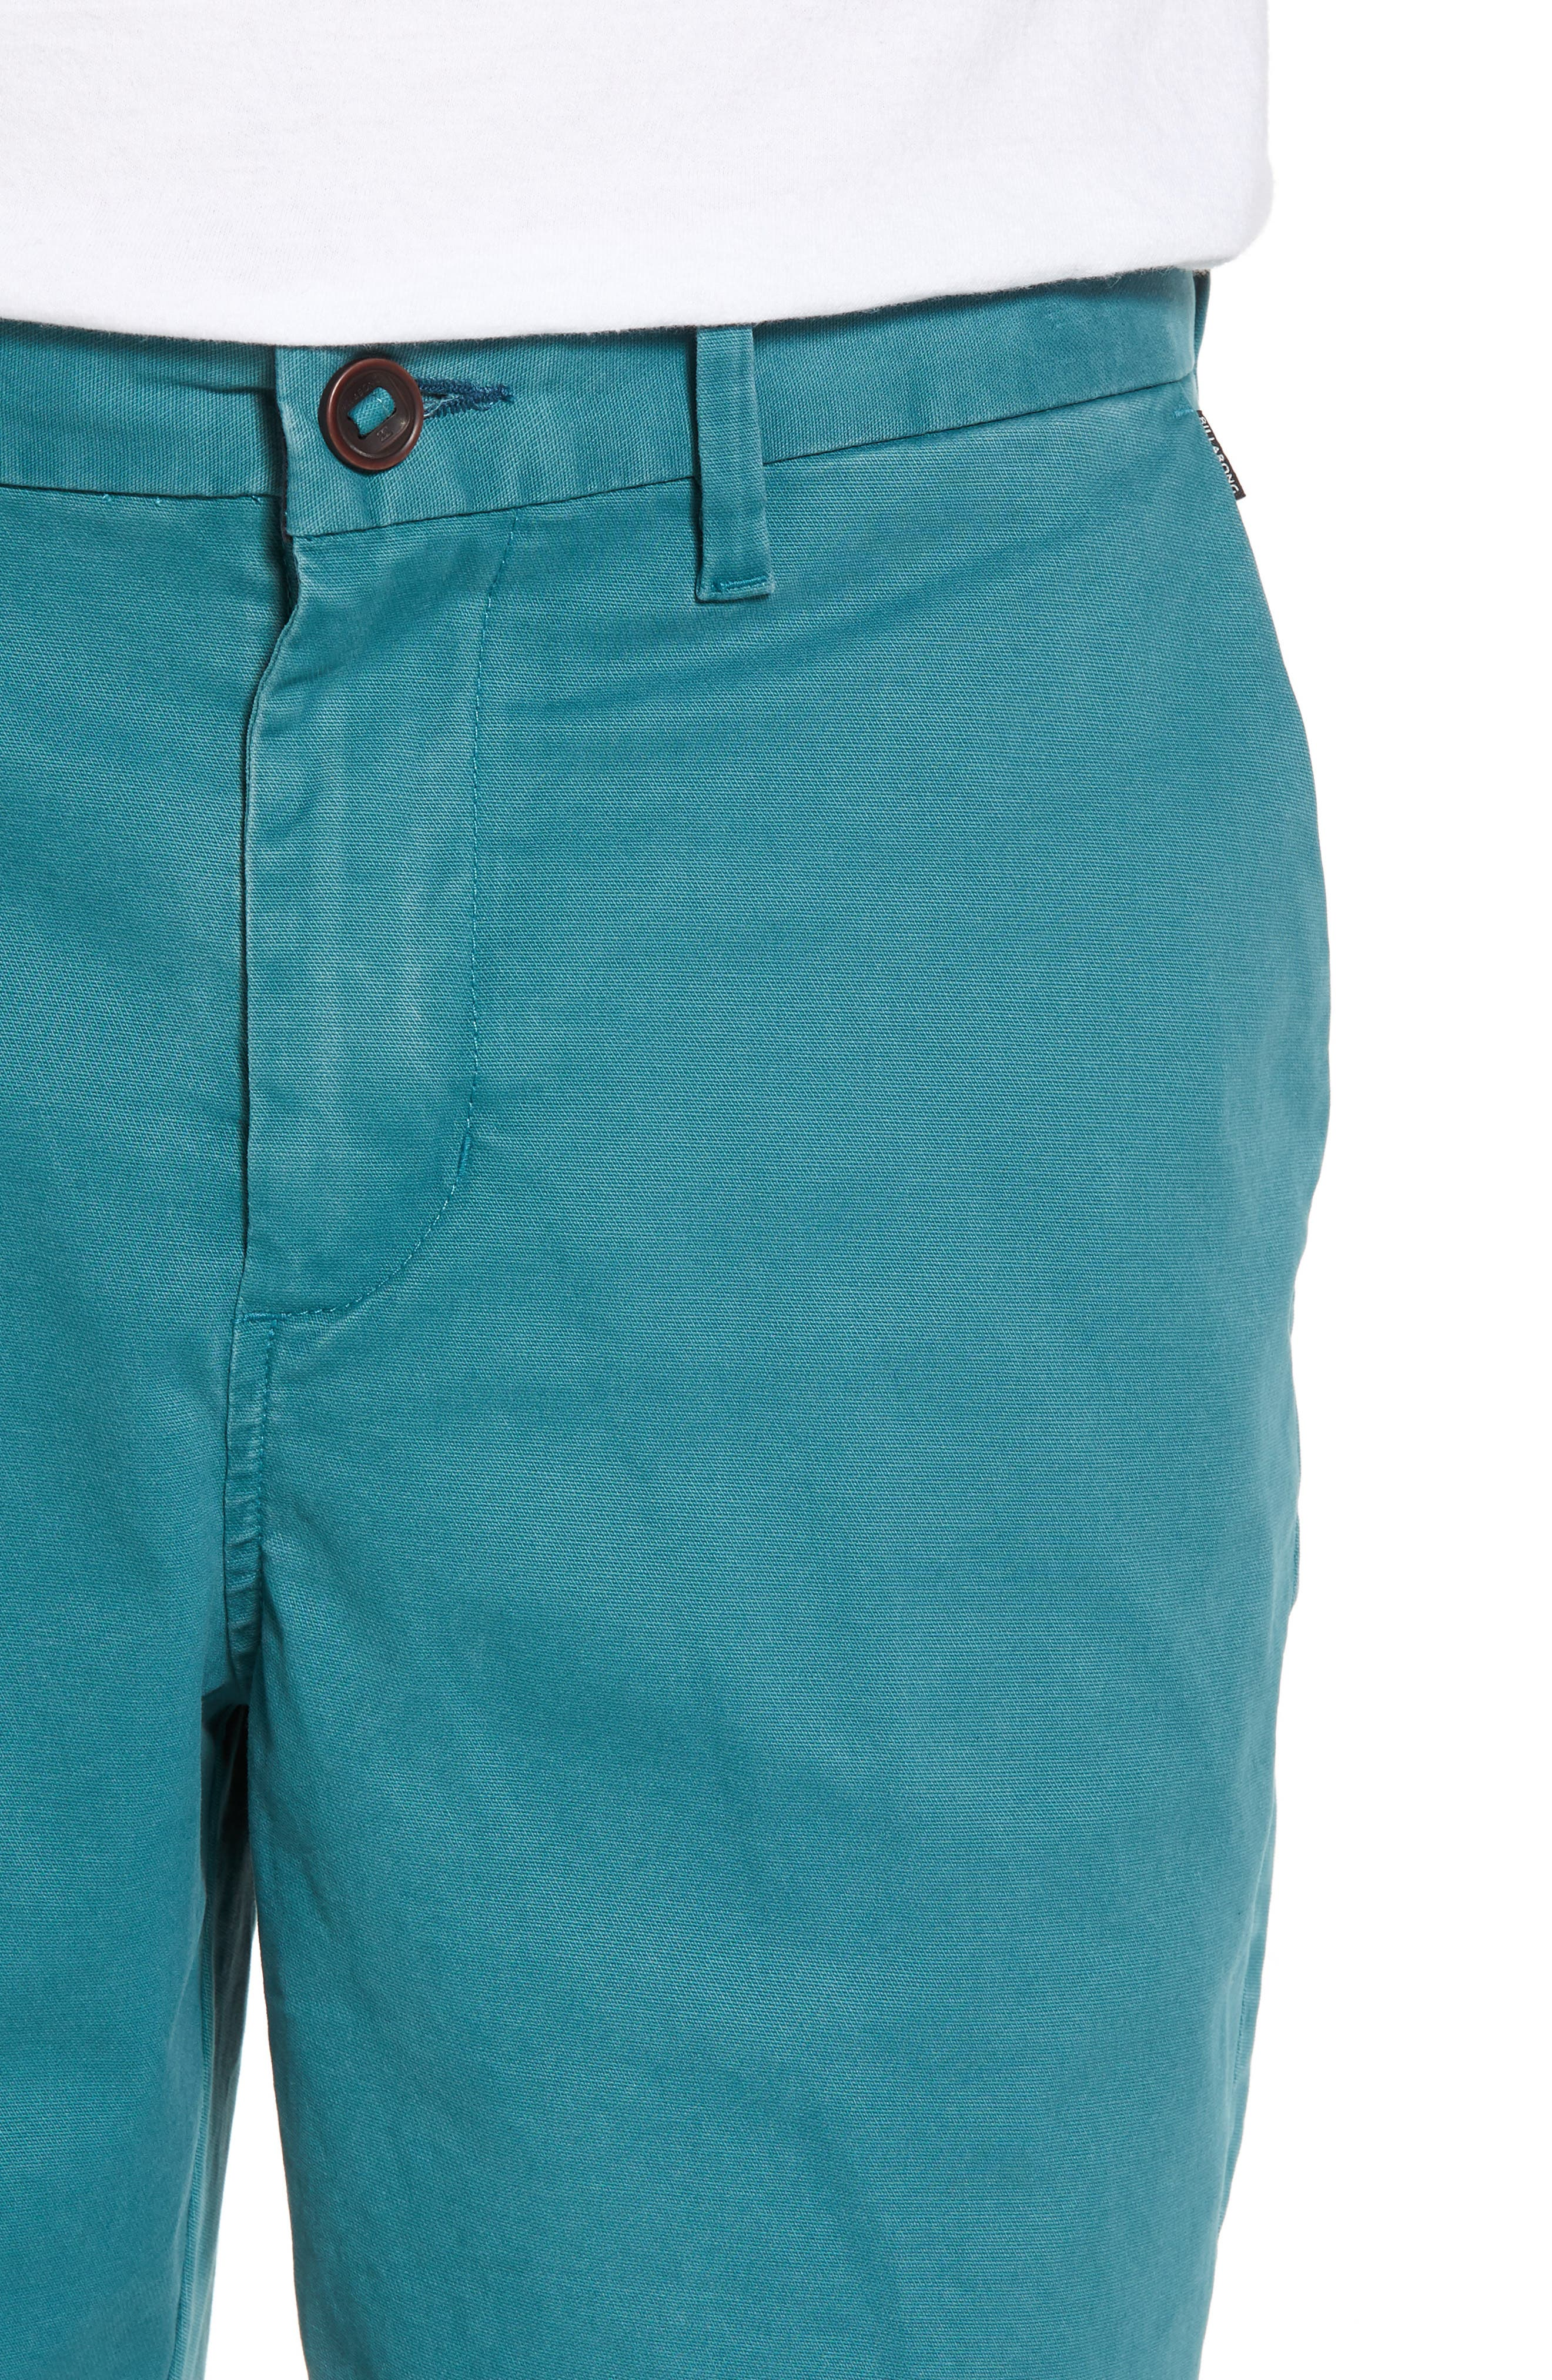 New Order Shorts,                             Alternate thumbnail 4, color,                             Hydro